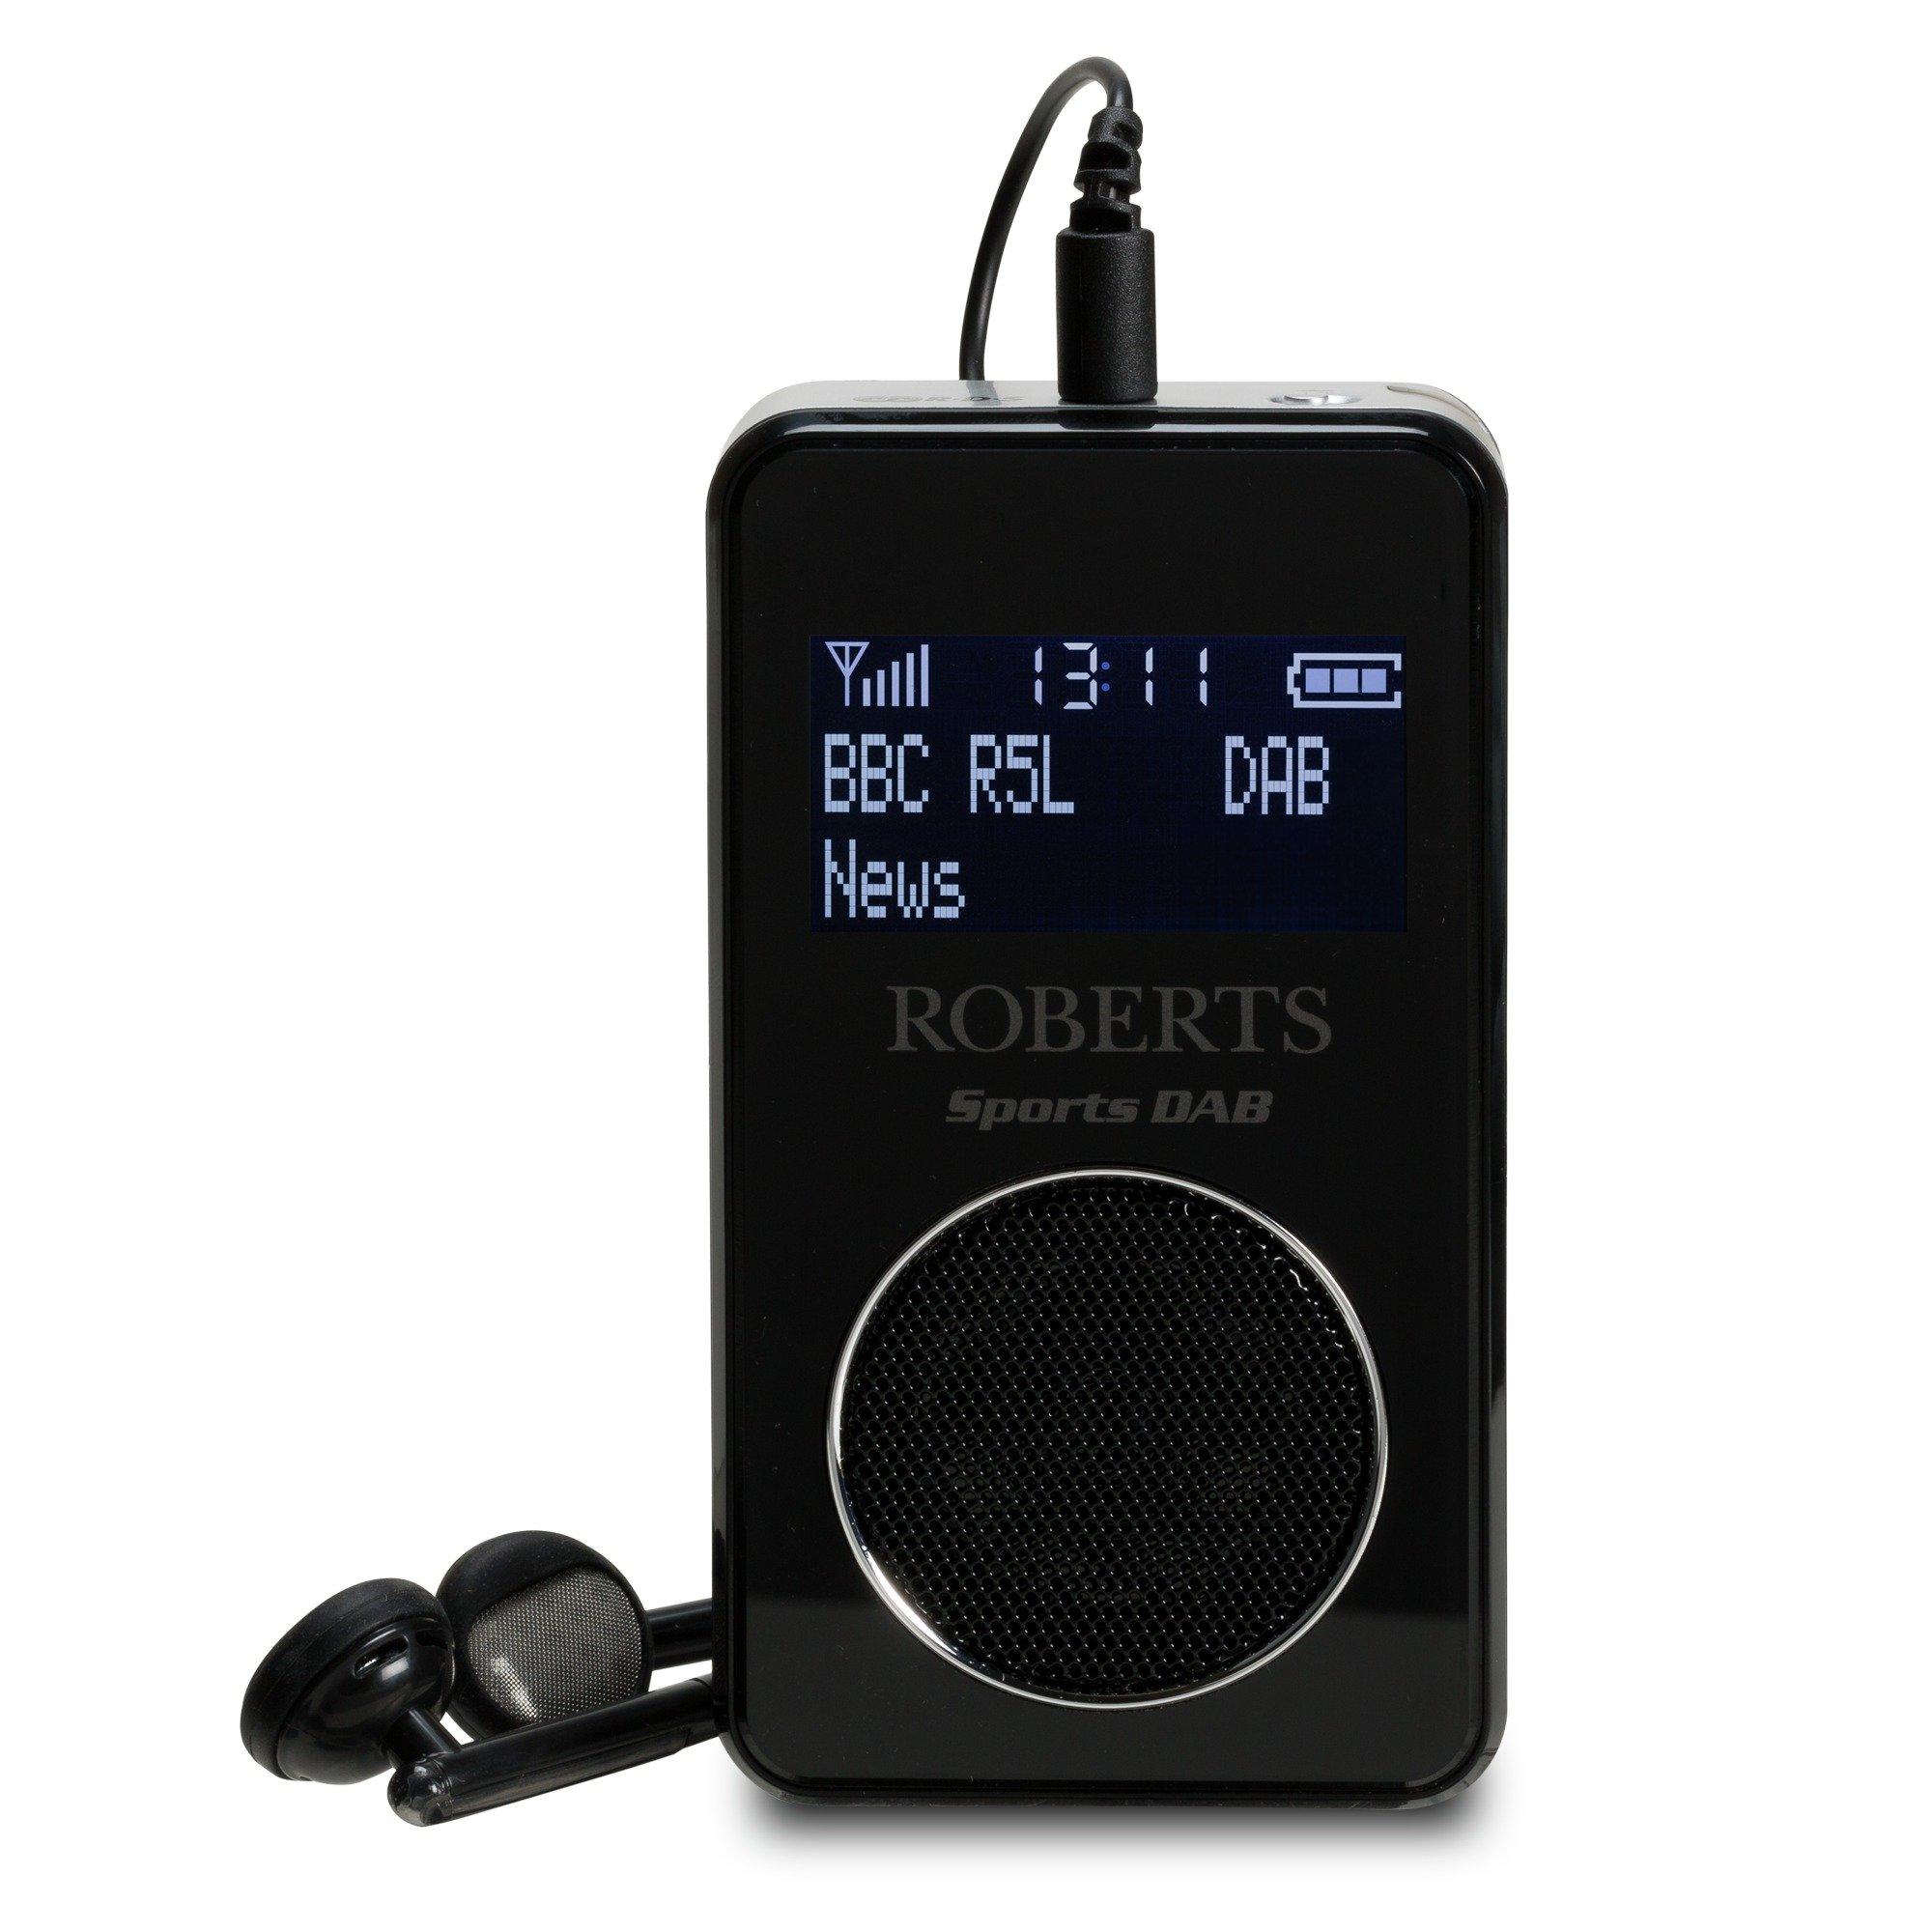 Roberts SportsDab6 FM/DAB/DAB+ Sports Radio- Black